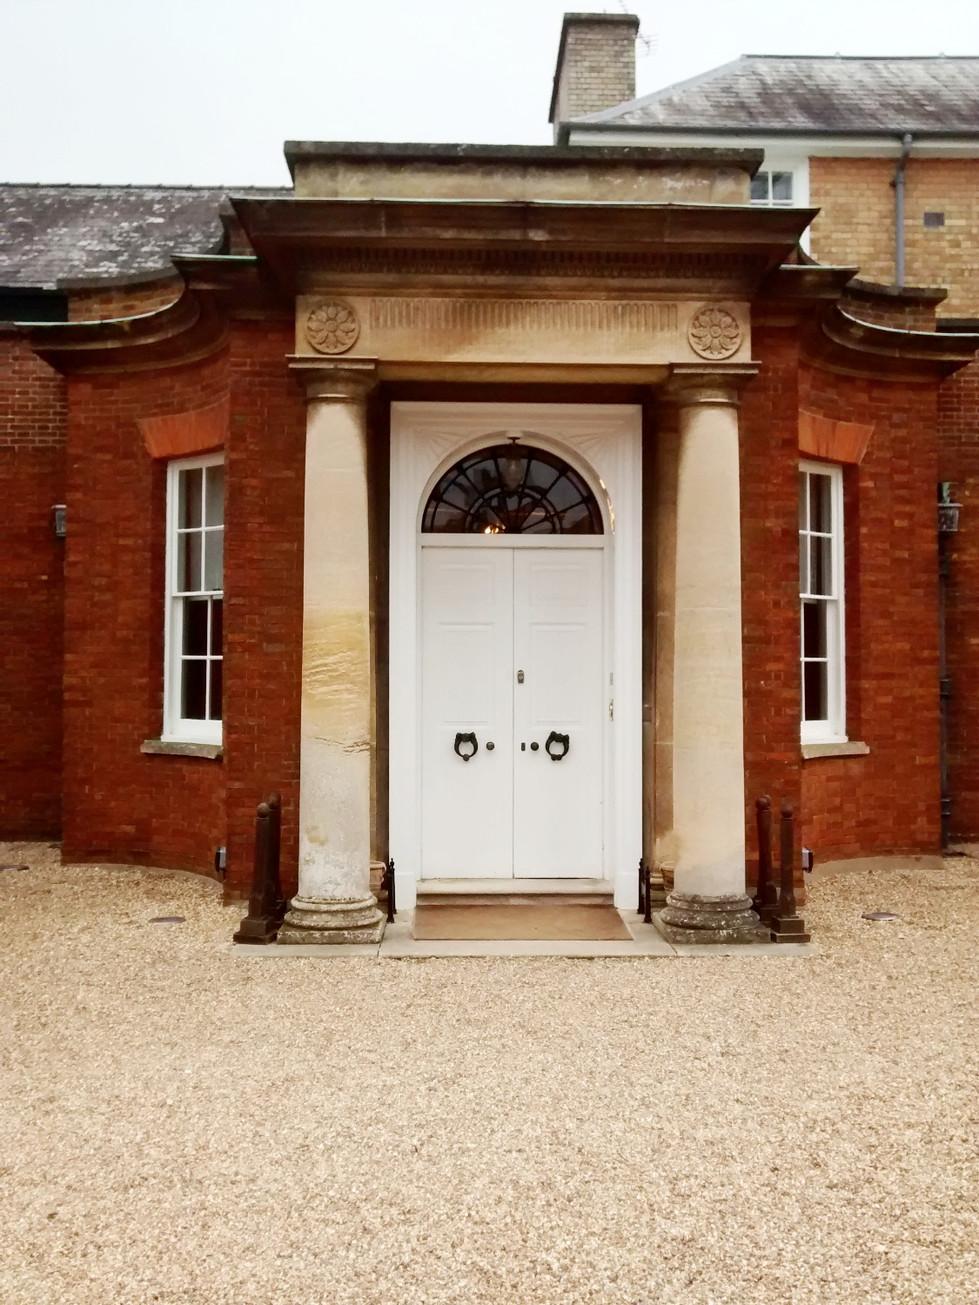 The Jockey Club Rooms